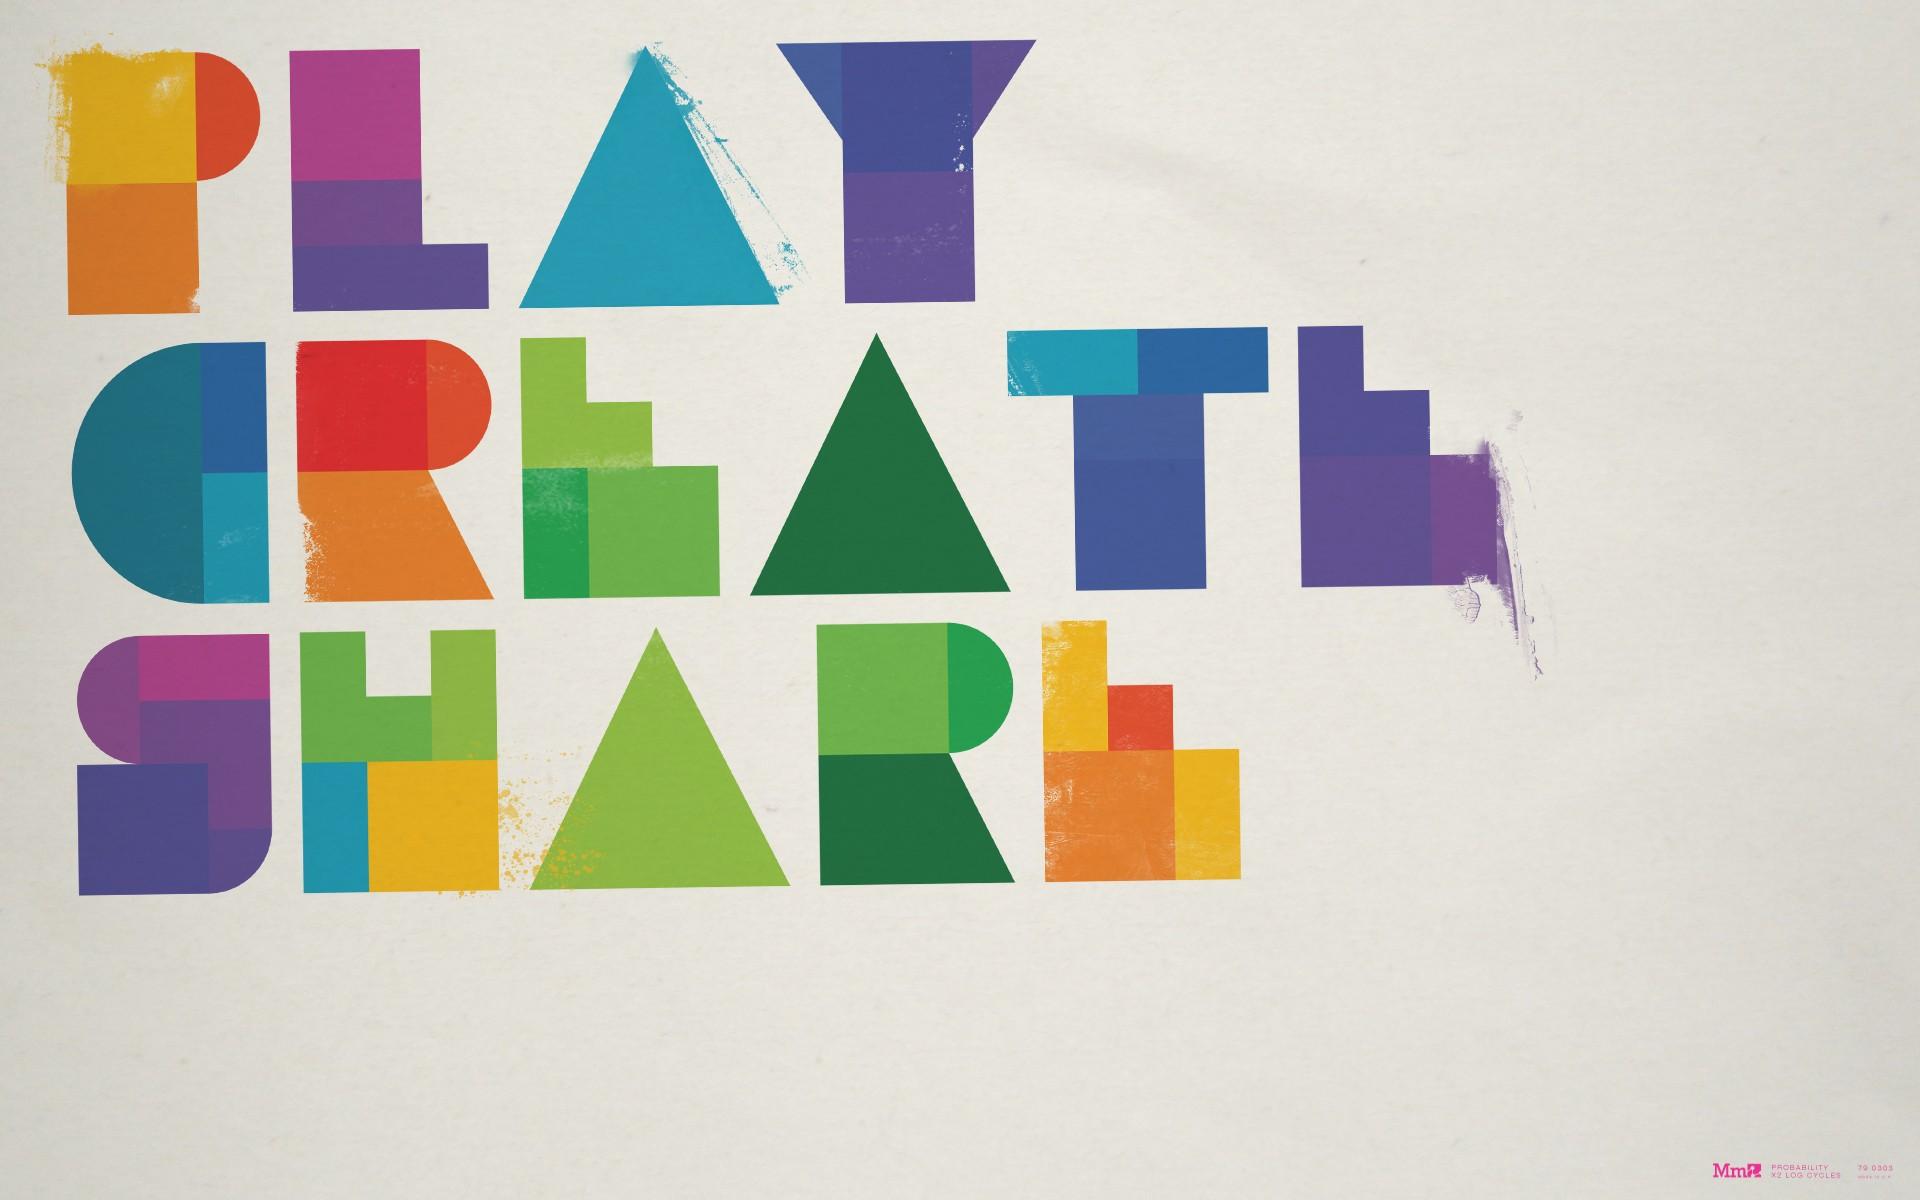 Wallpaper : illustration, typography, text, logo, graphic design ...